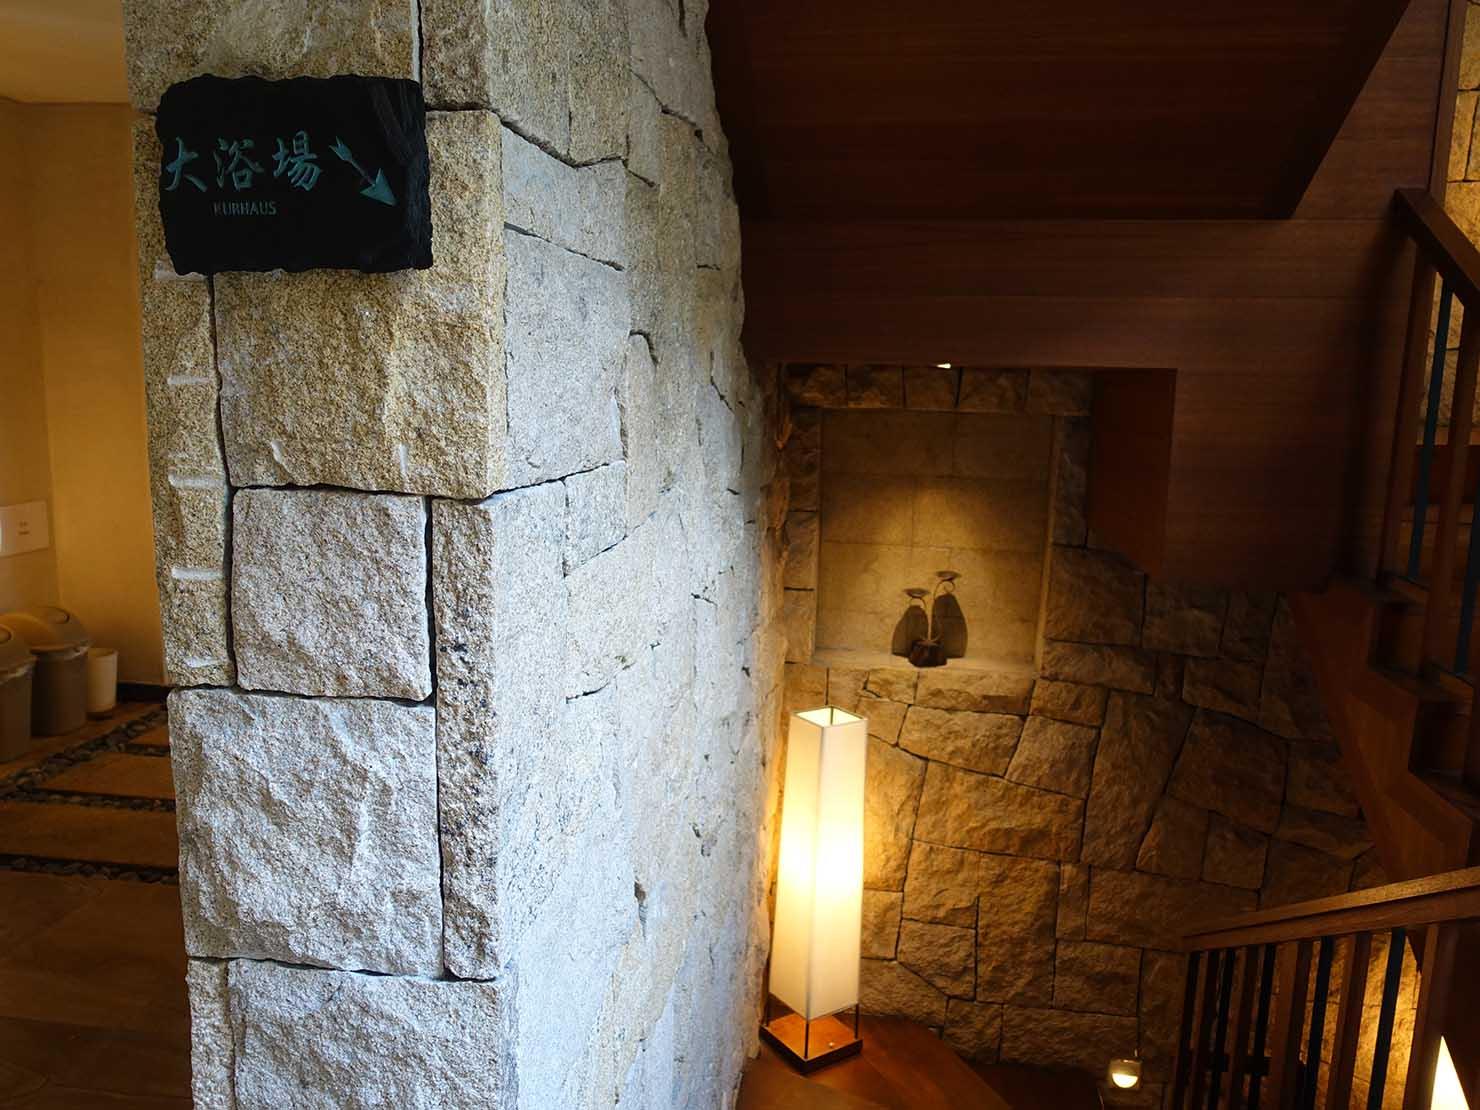 台北・烏來温泉「Volando Urai Spring Spa & Resort 馥蘭朵烏來渡假酒」大浴場への入り口